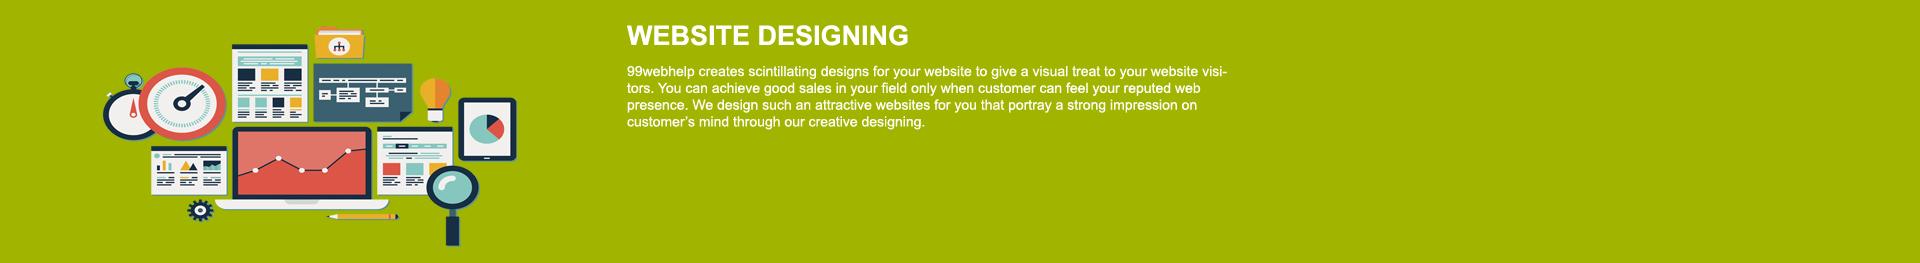 responsive web design india